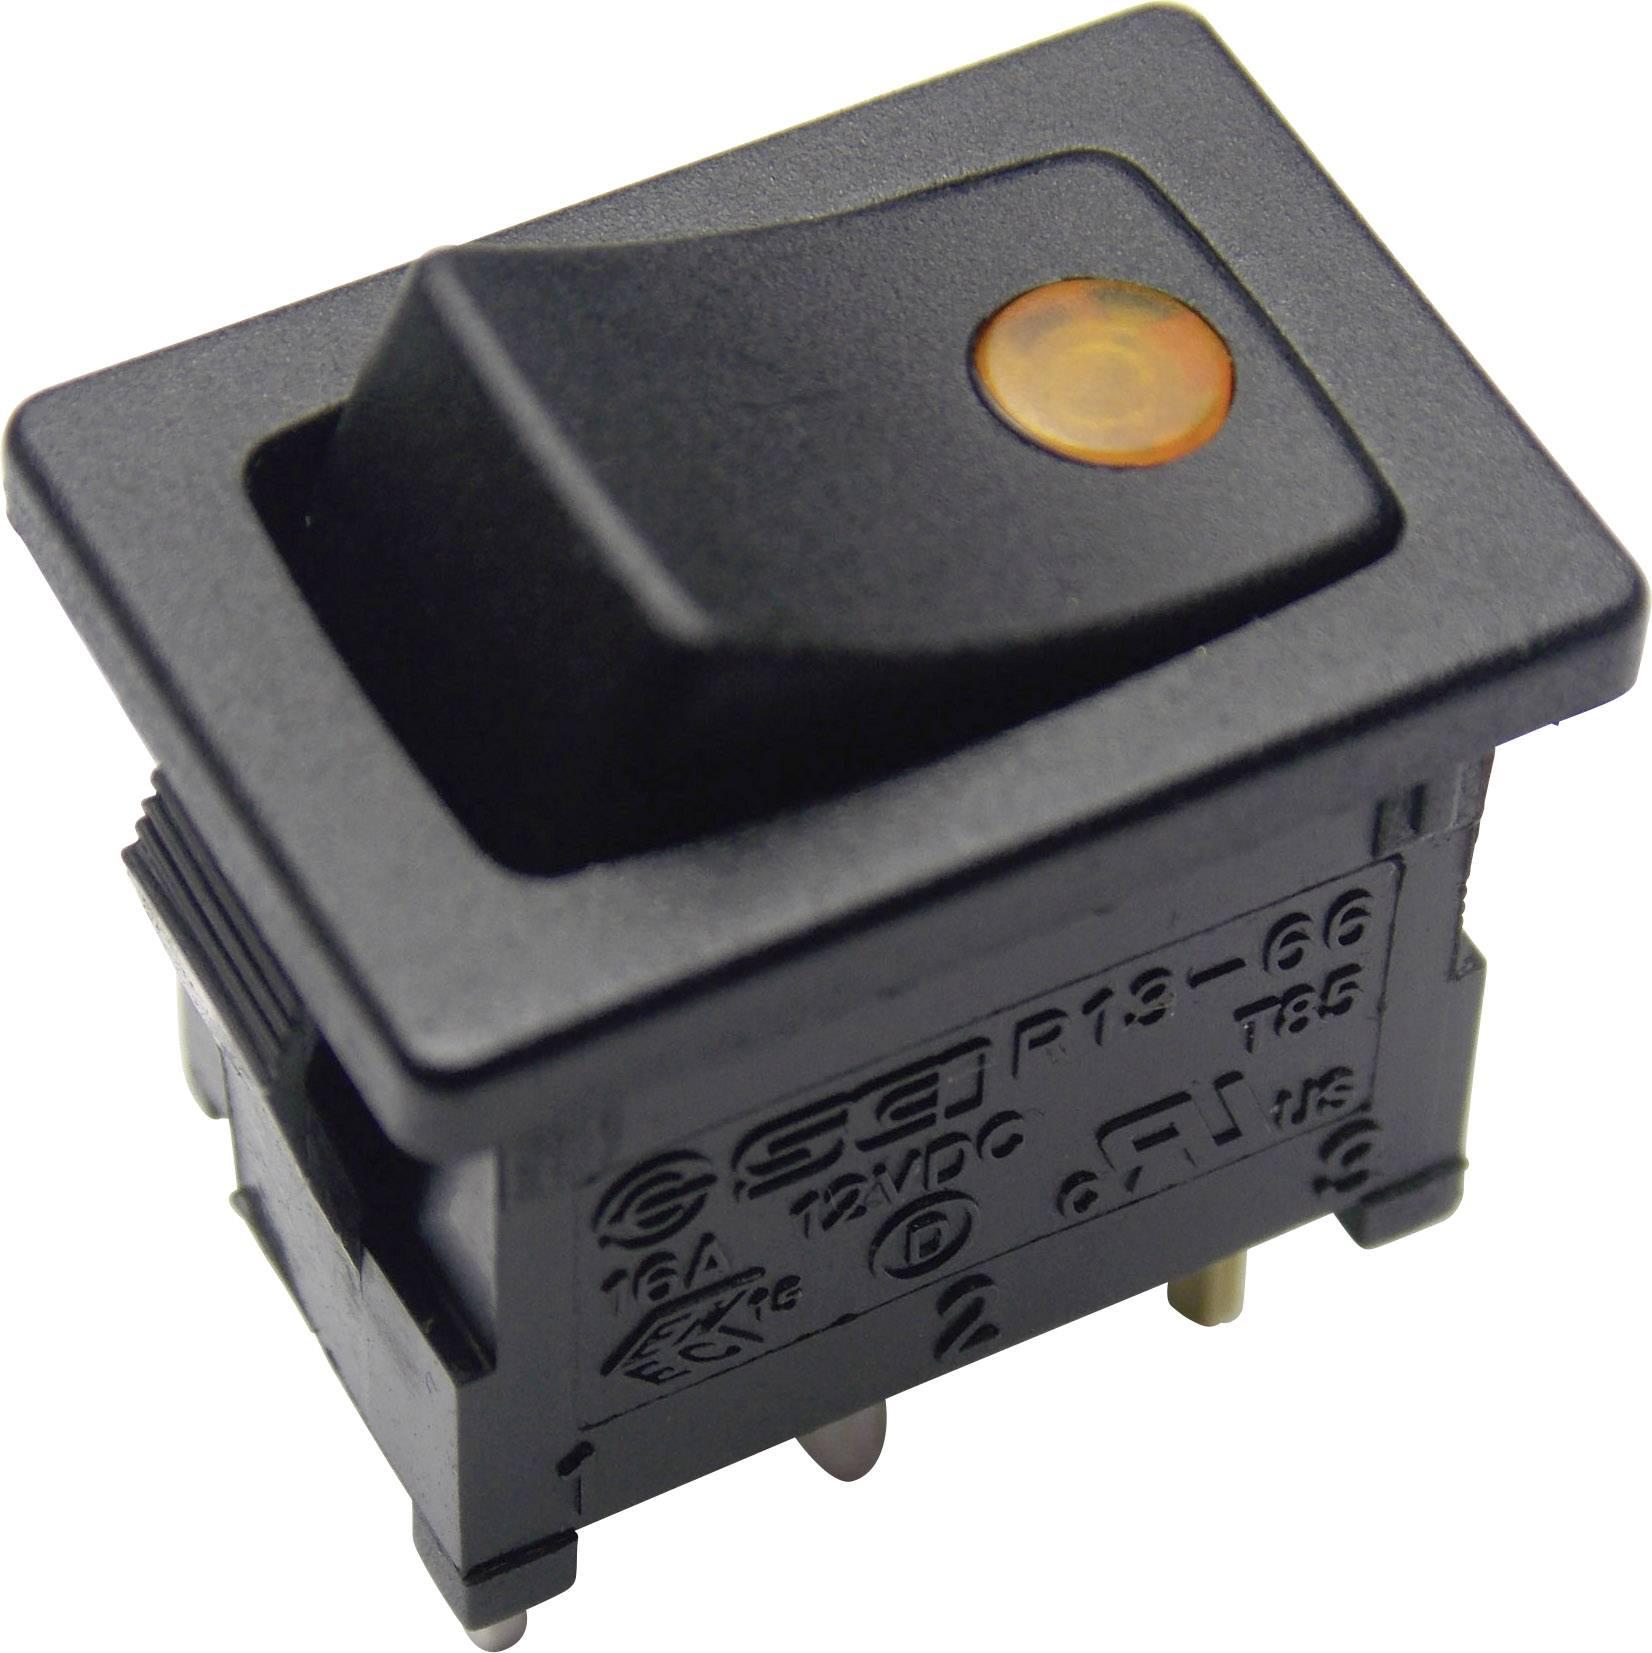 Kolébkový spínač s aretací TRU COMPONENTS TC-R13-66B2-02 B/B, 12 V/DC, 16 A, 1x vyp/zap, žlutá, 1 ks